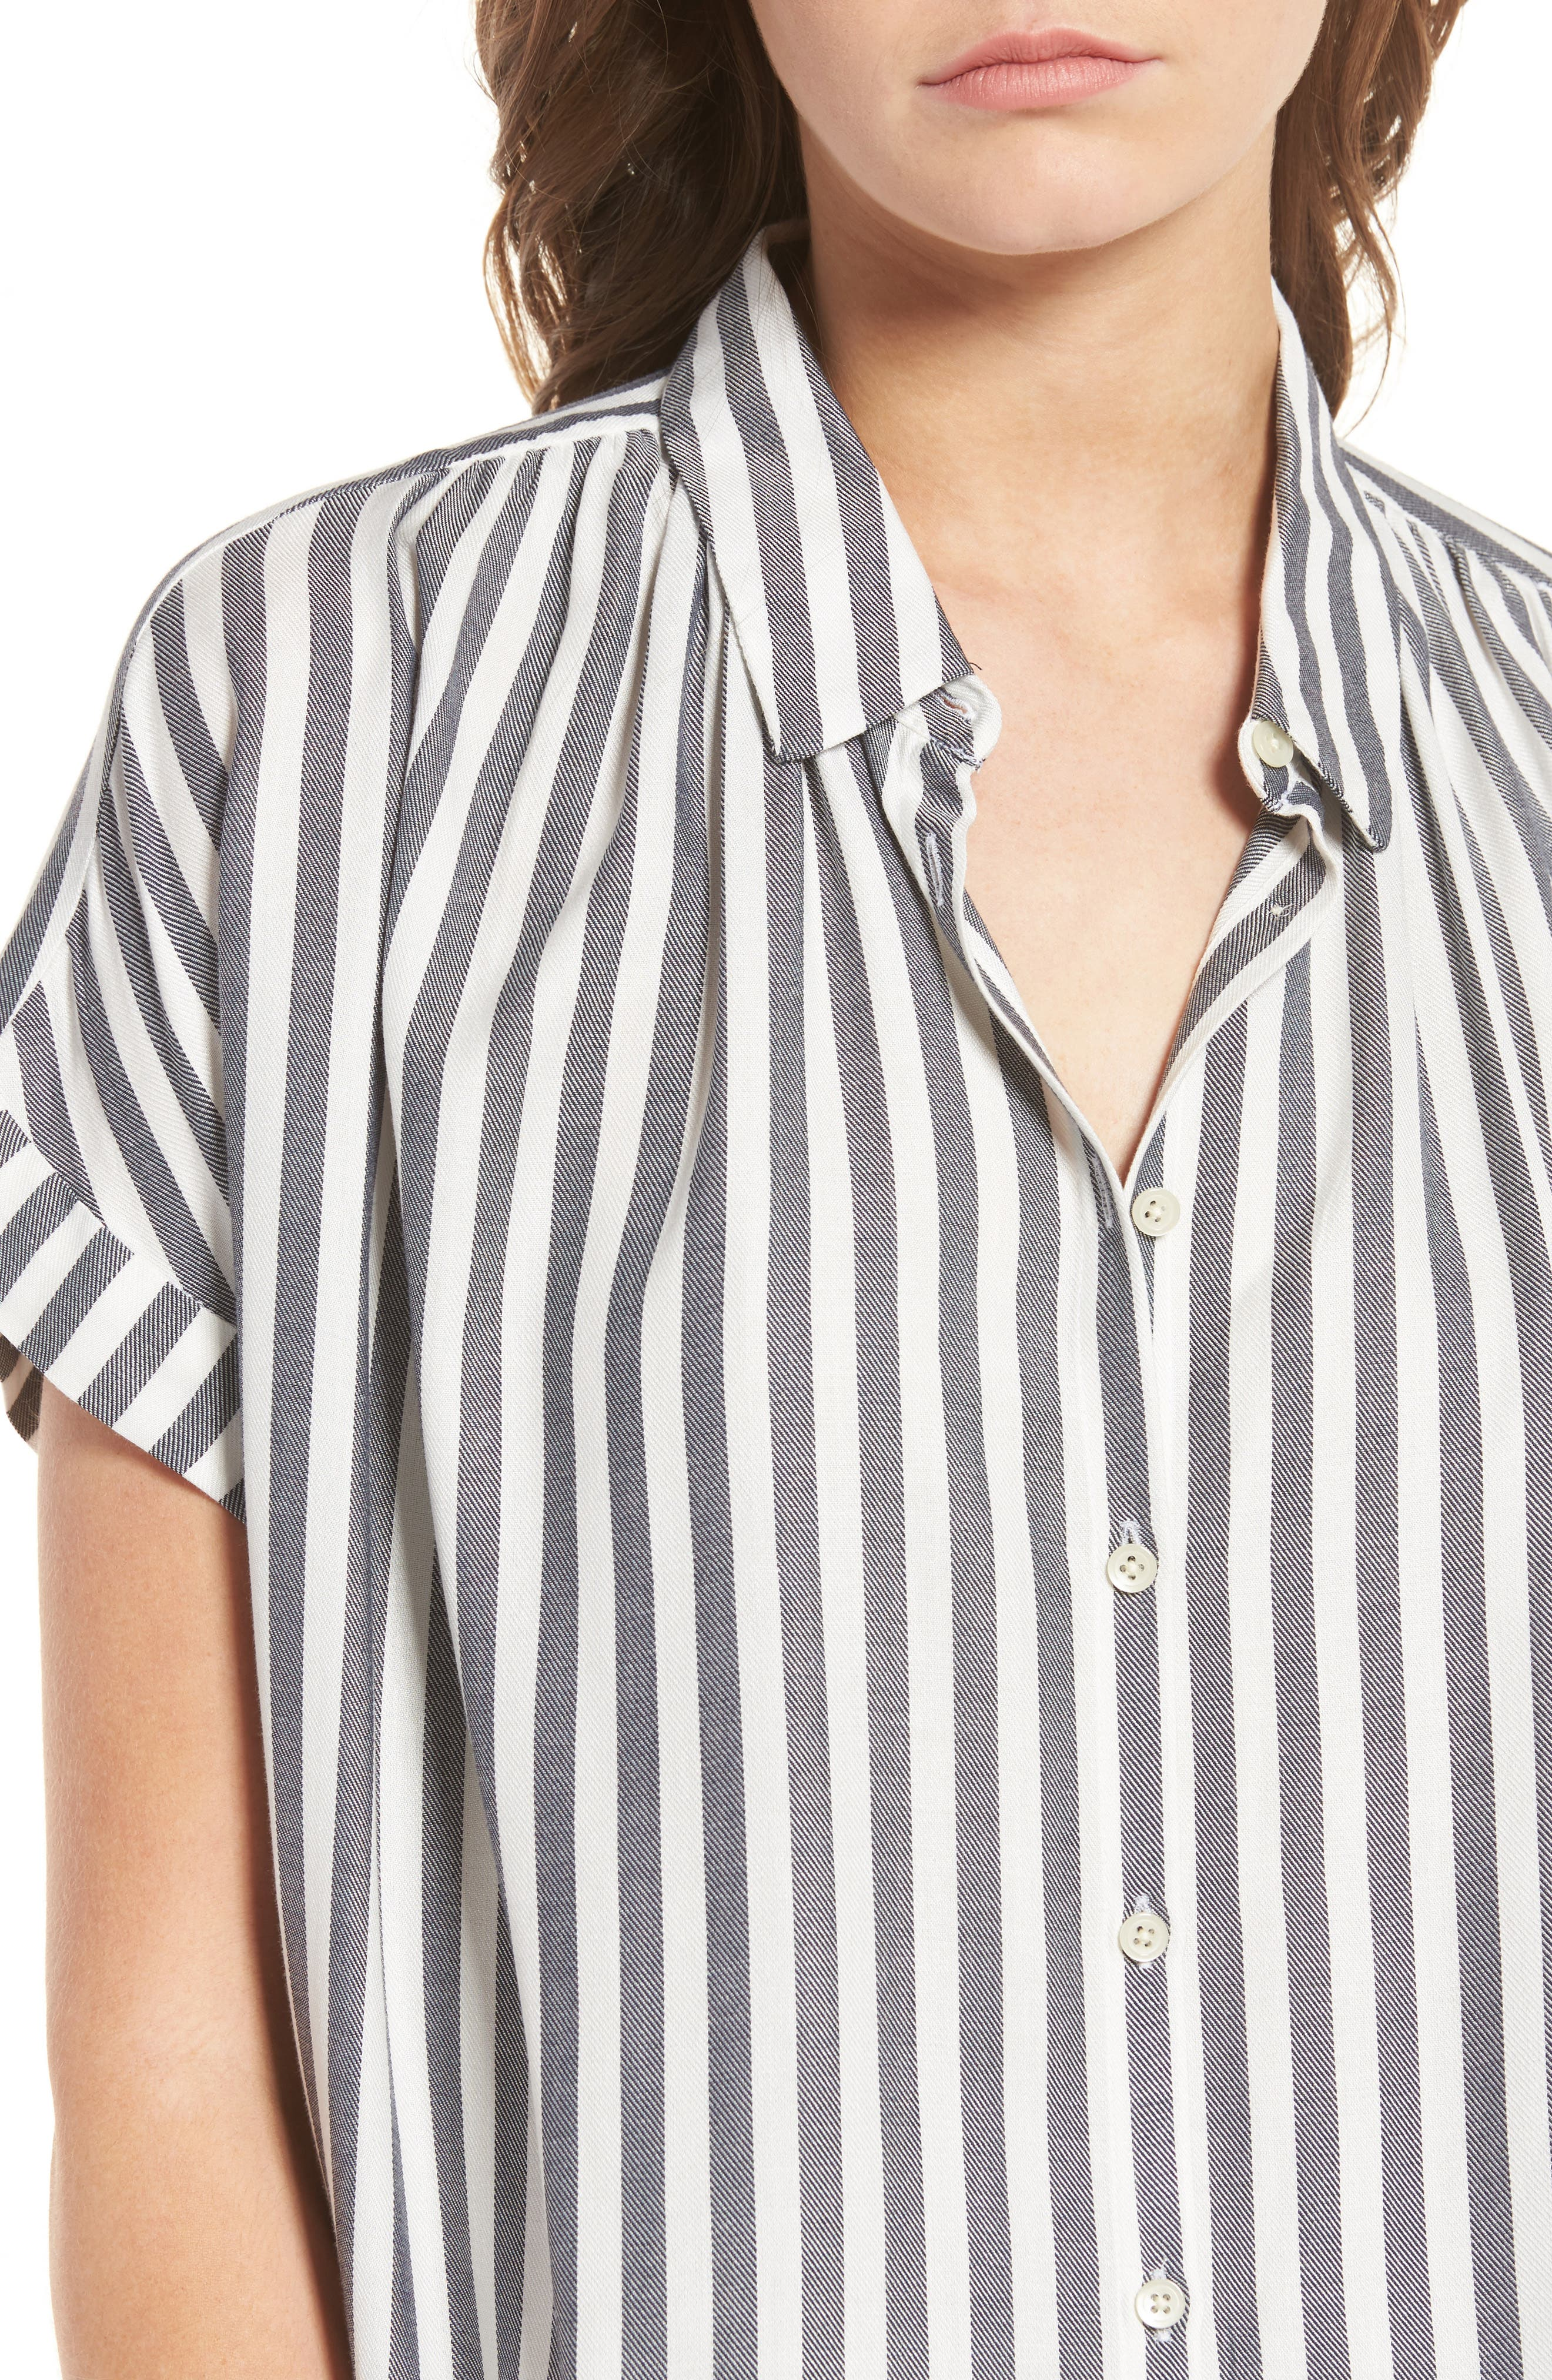 Central Shirt,                             Alternate thumbnail 4, color,                             401